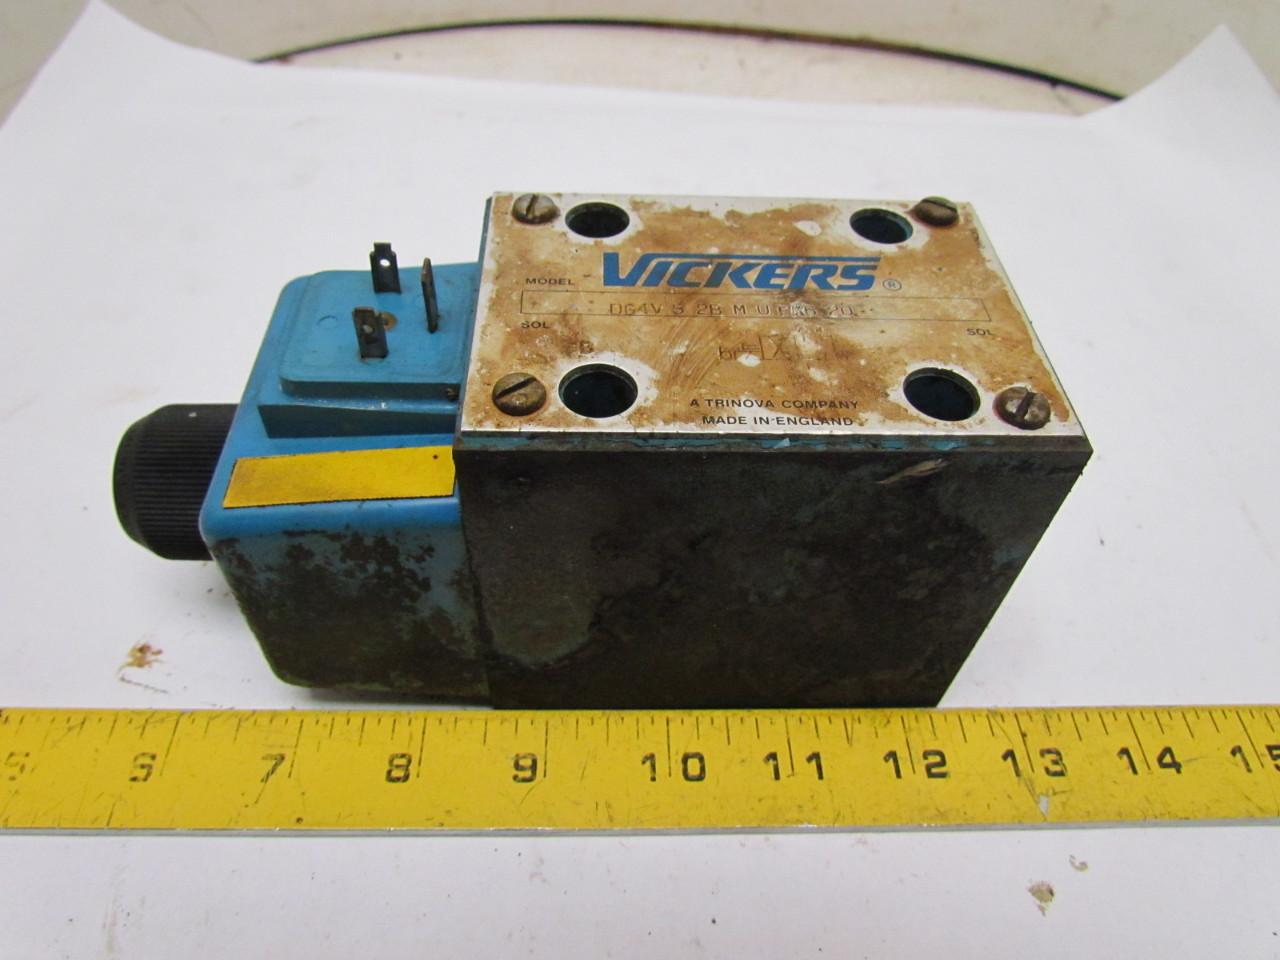 Vickers DG4V-5-2B-MU-EK6-20 Hydraulic Directional Control Valve 115VAC